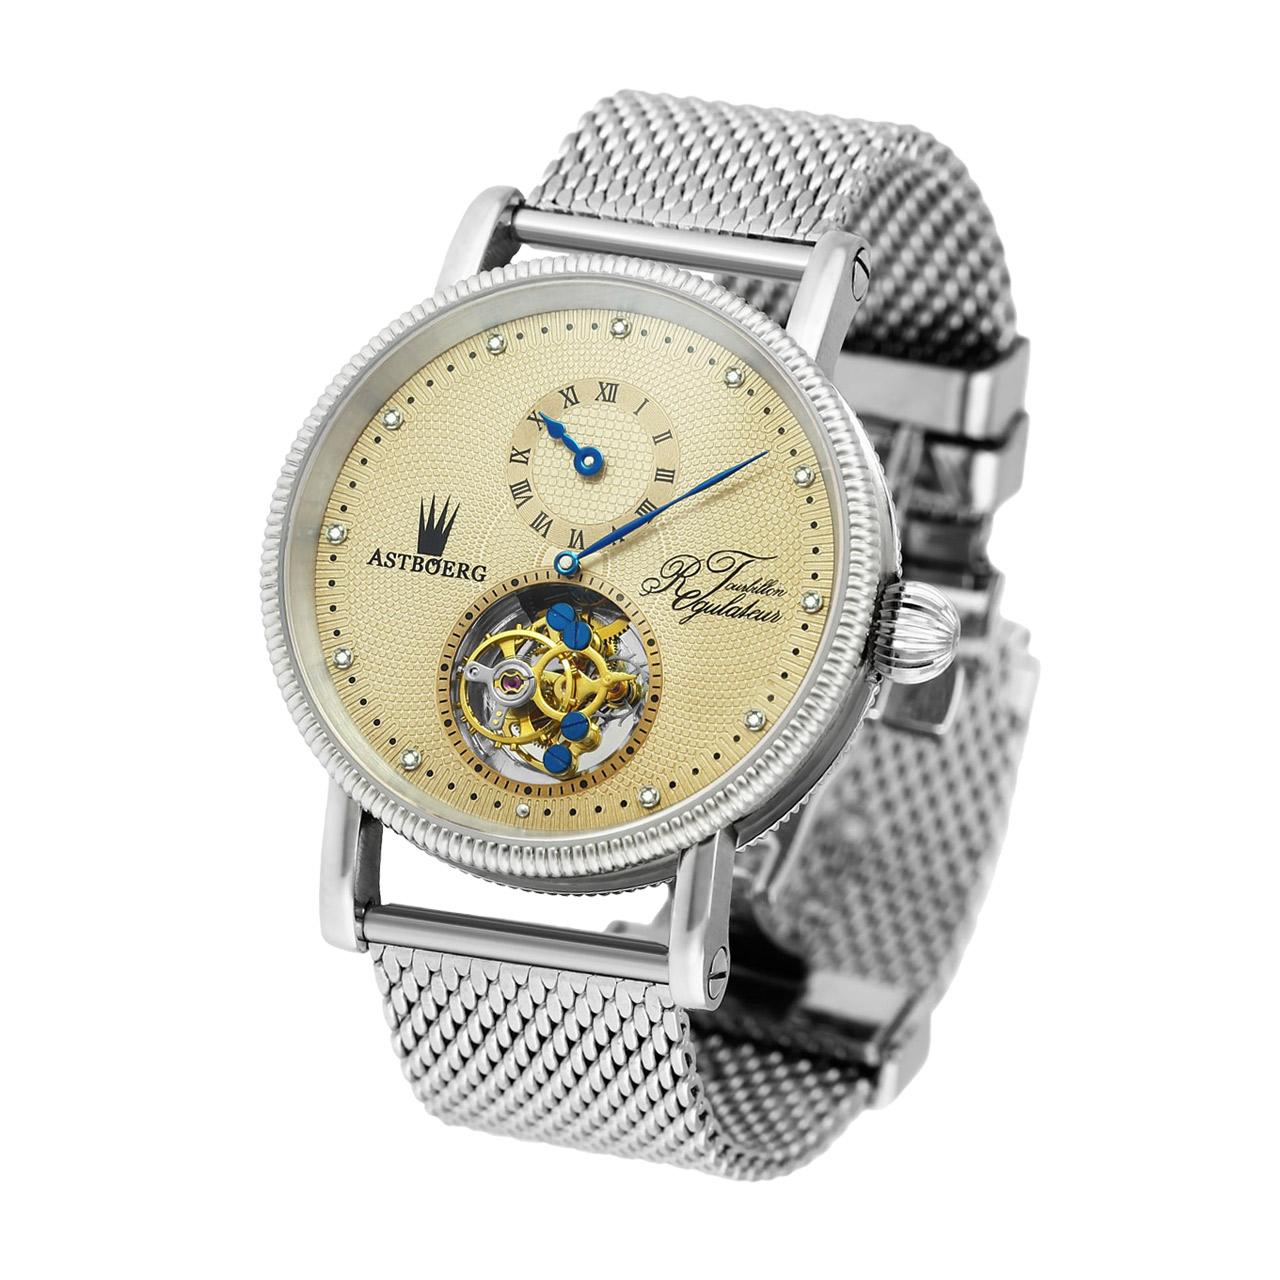 Astboerg Regulator AT702M1 Tourbillon Armbanduhr mit Diamanten